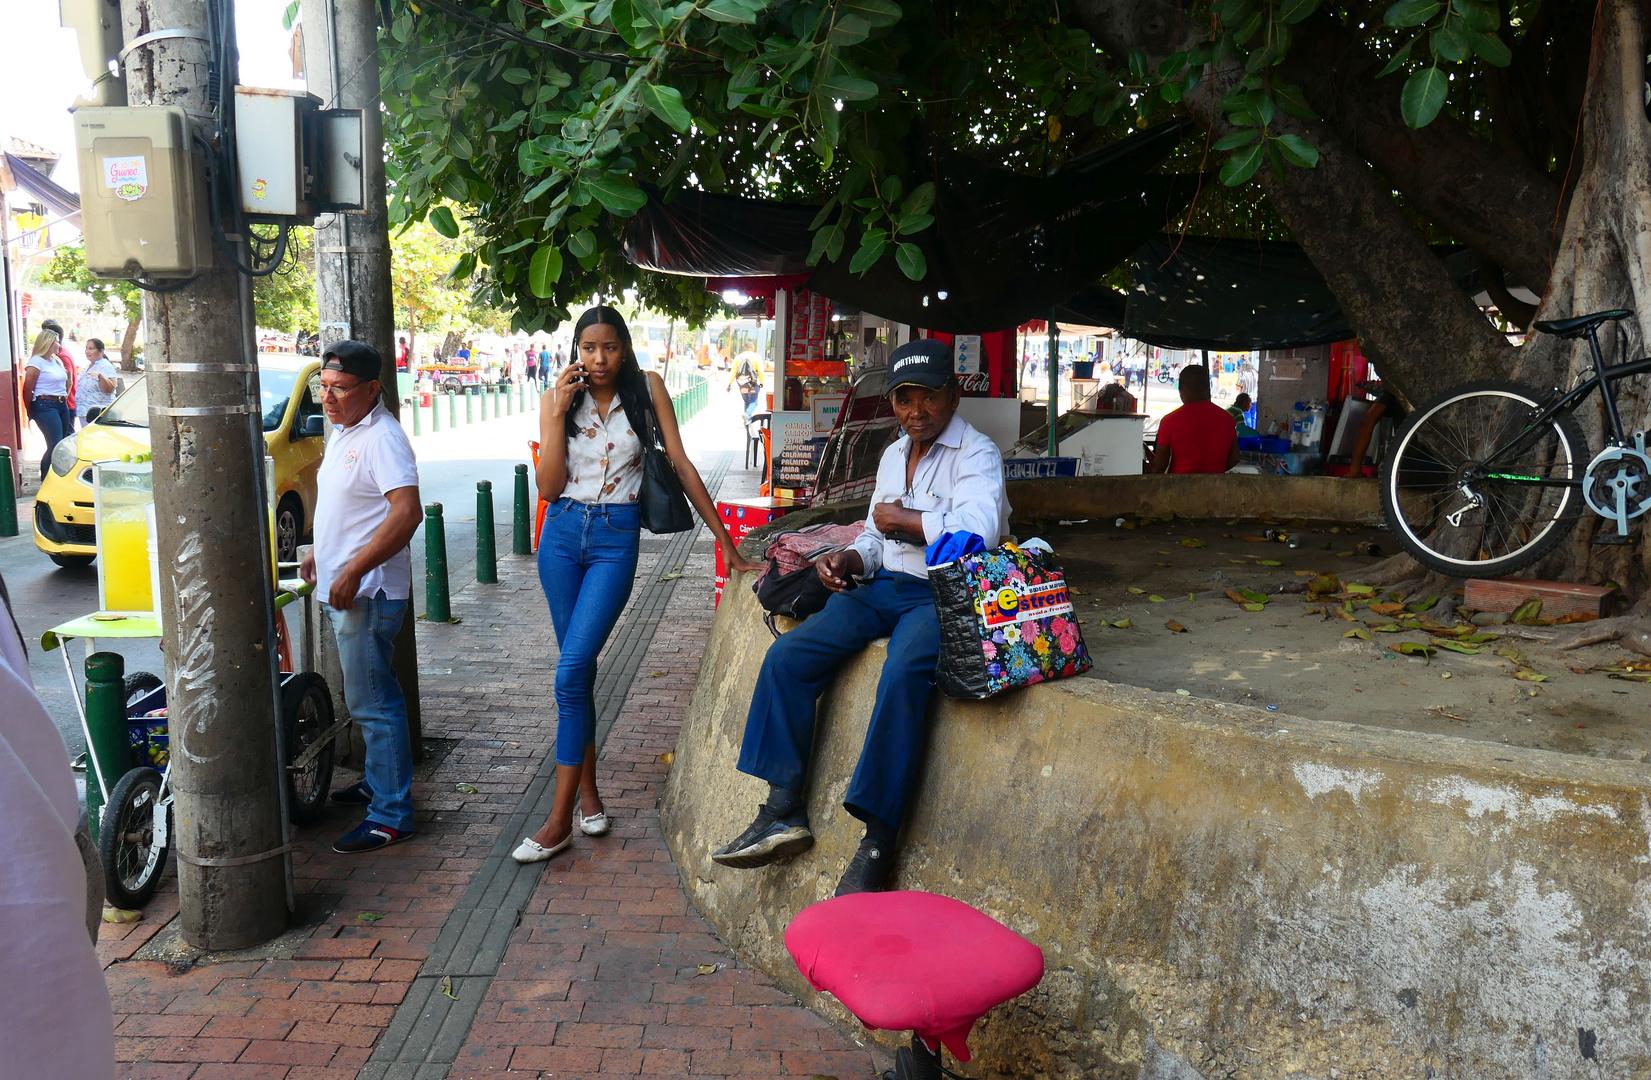 Kreuzfahrt_Kolumbien-Cartagena Strassenszene